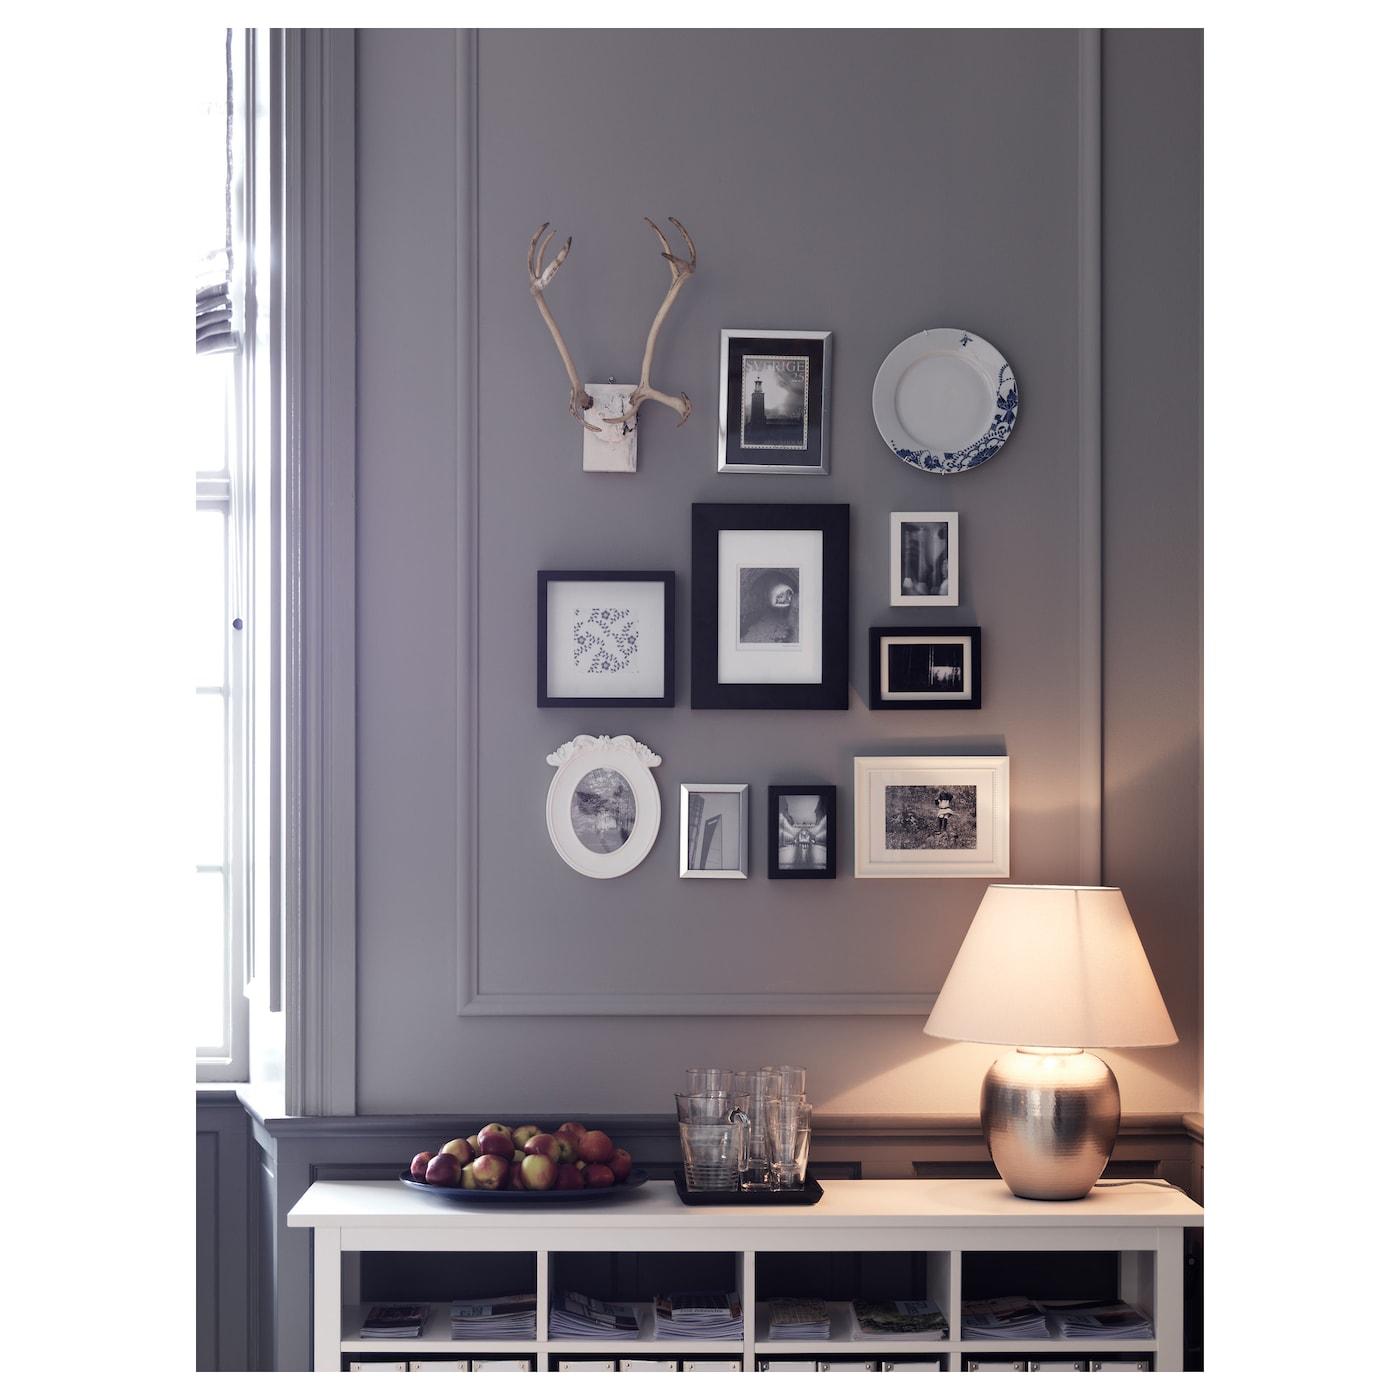 ribba cadre noir 10x15 cm ikea. Black Bedroom Furniture Sets. Home Design Ideas